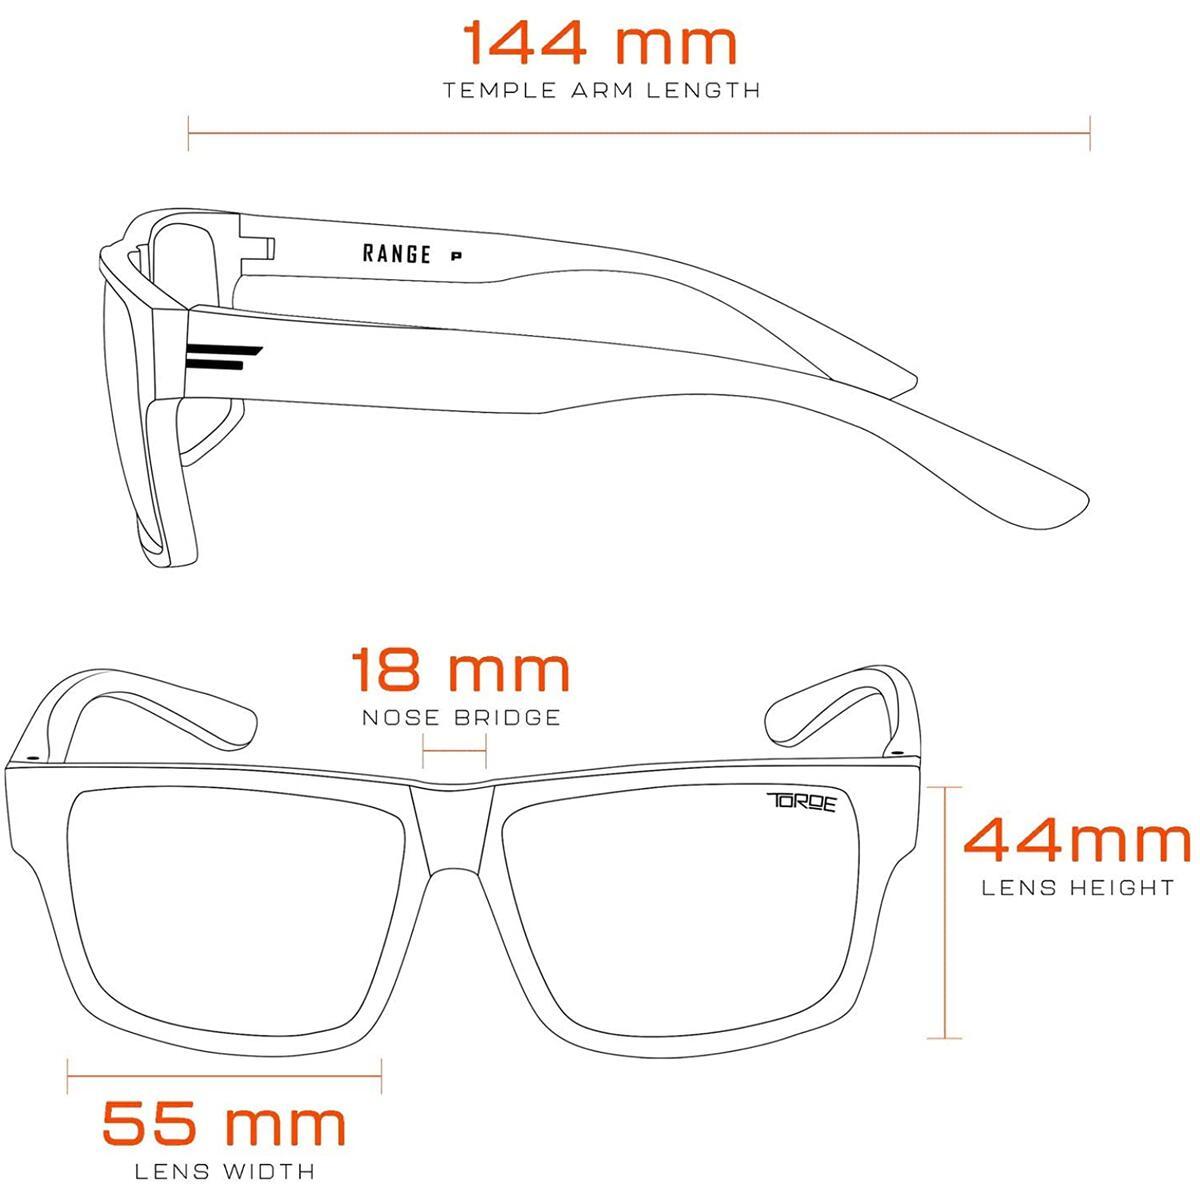 TOROE Classic RANGE Black Frame Polarized TR90 Unbreakable Sunglasses with Hydrophobic Coated Polycarbonate AR Lenses